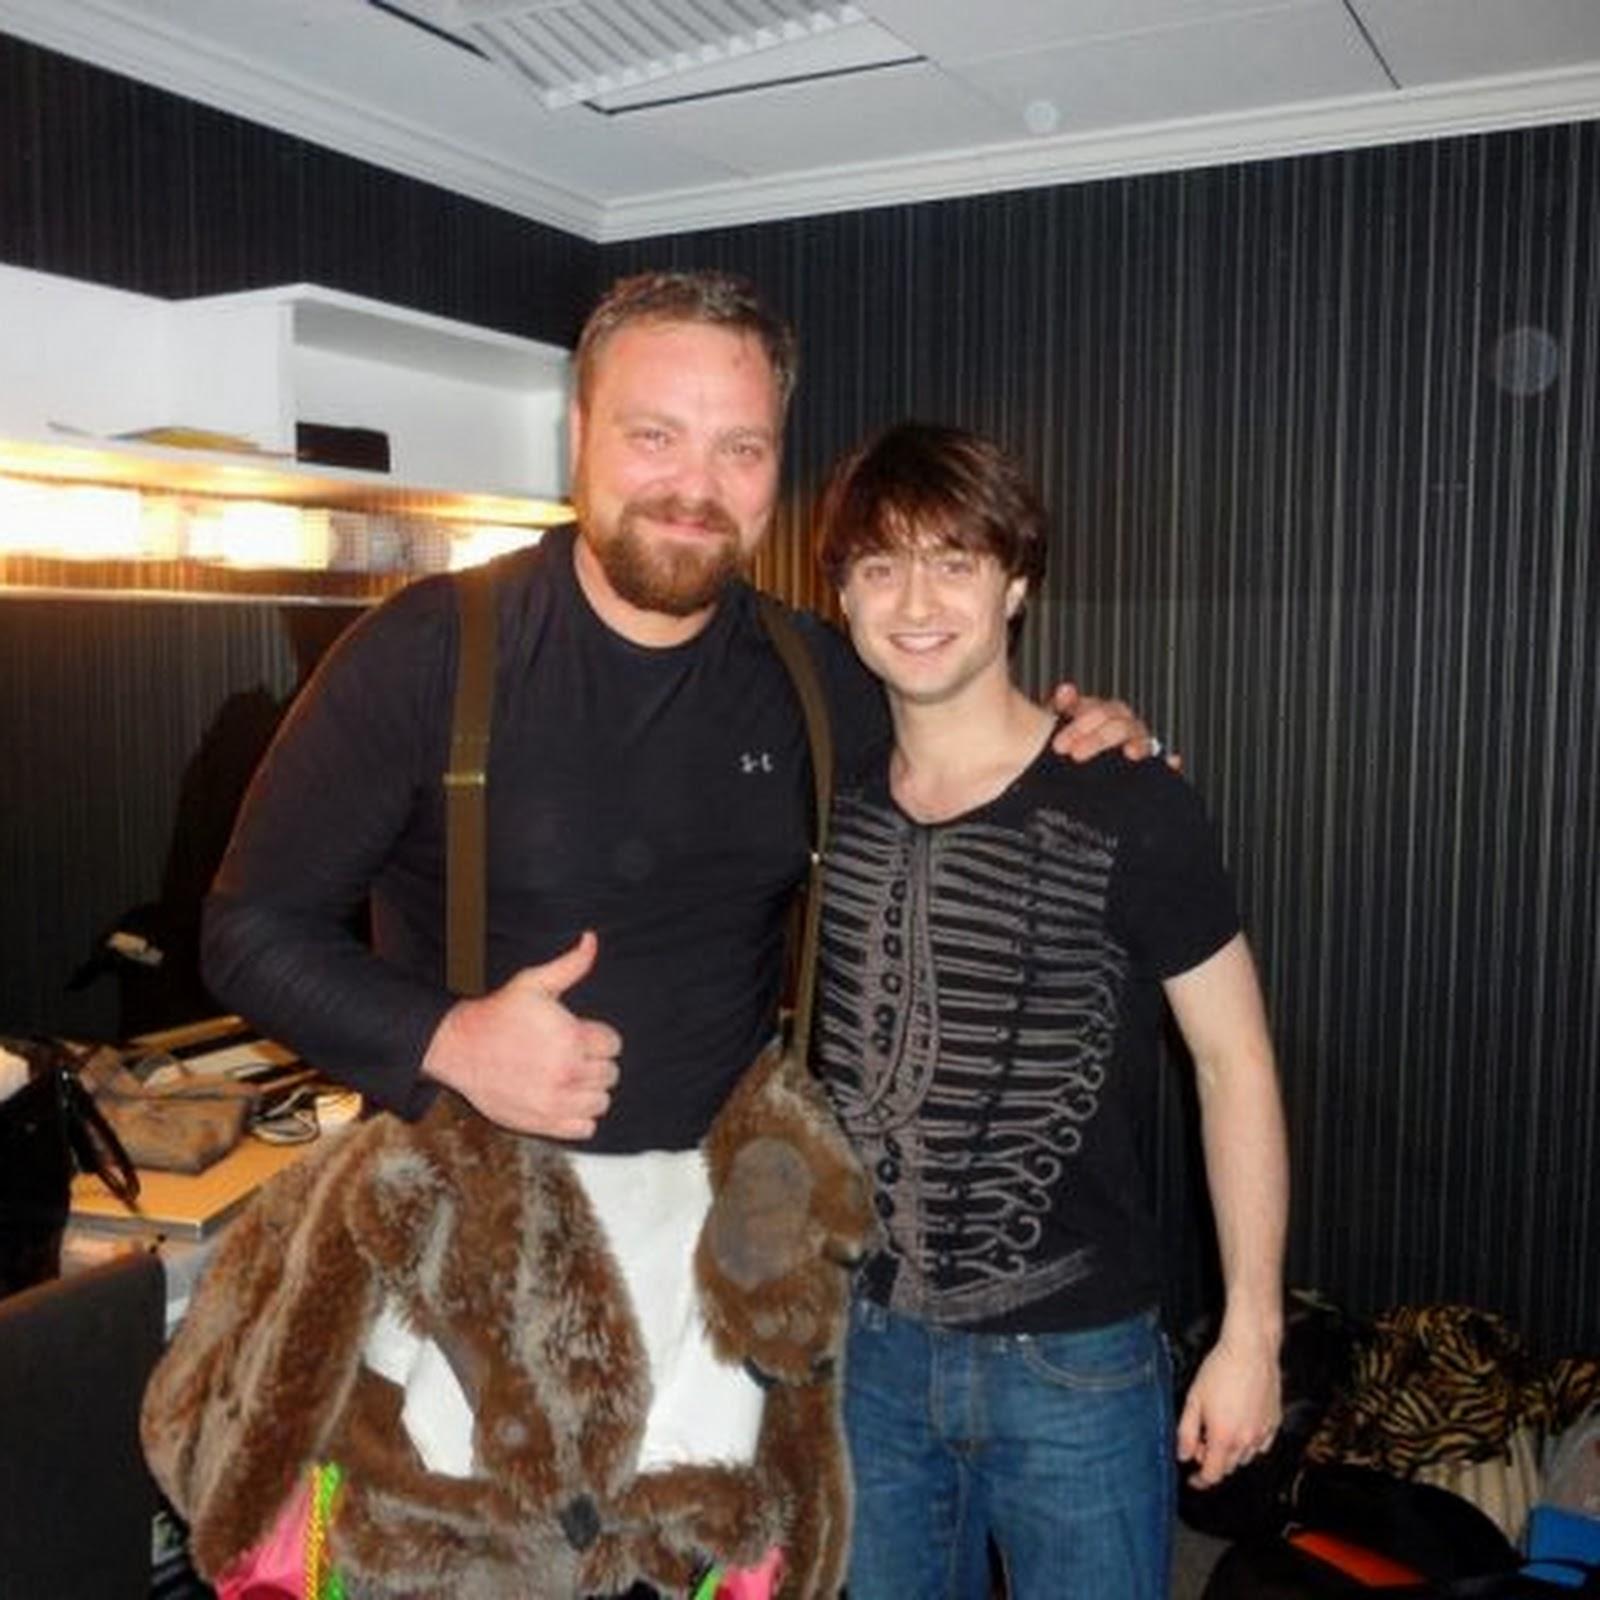 Updated: Daniel backstage at Pee-wee Herman Show